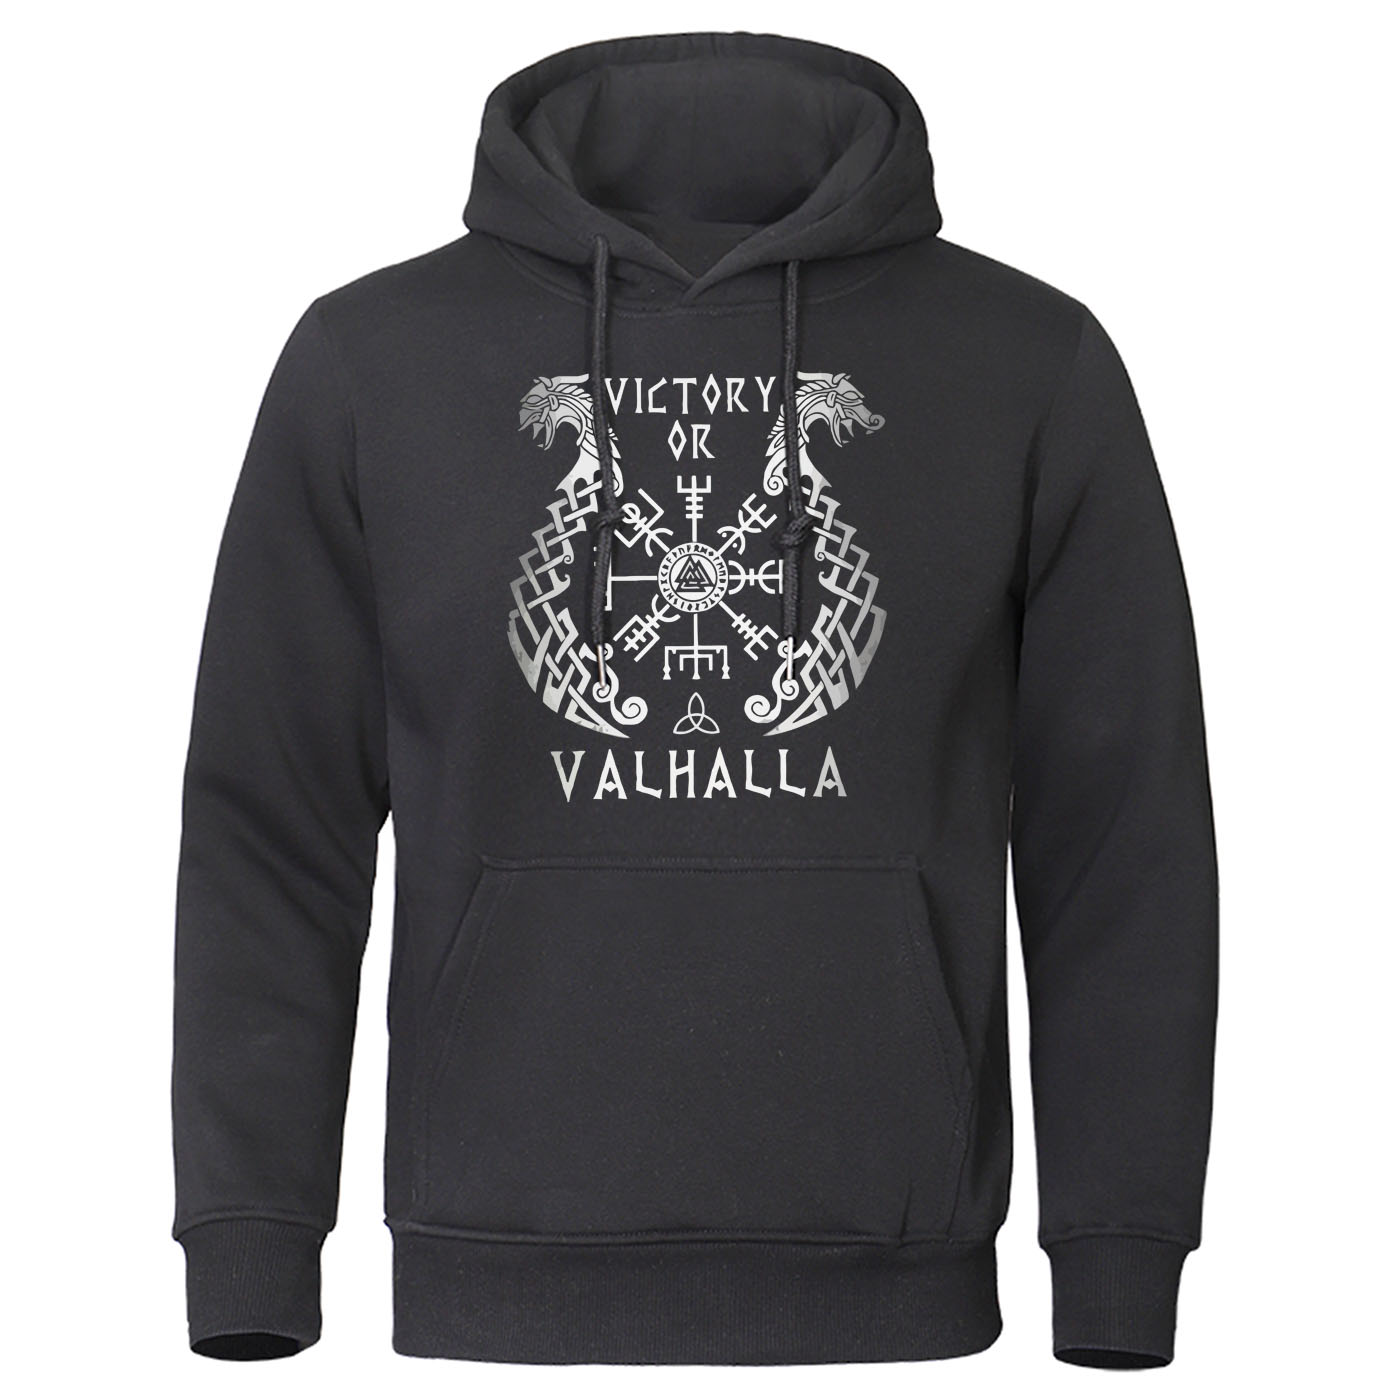 2019 Autumn Winter Pullover Fleece Warm Streetwear Casual Hoody Viking Legend Men Hoodies Sweatshirt Valhalla Odin Mens Hoodie